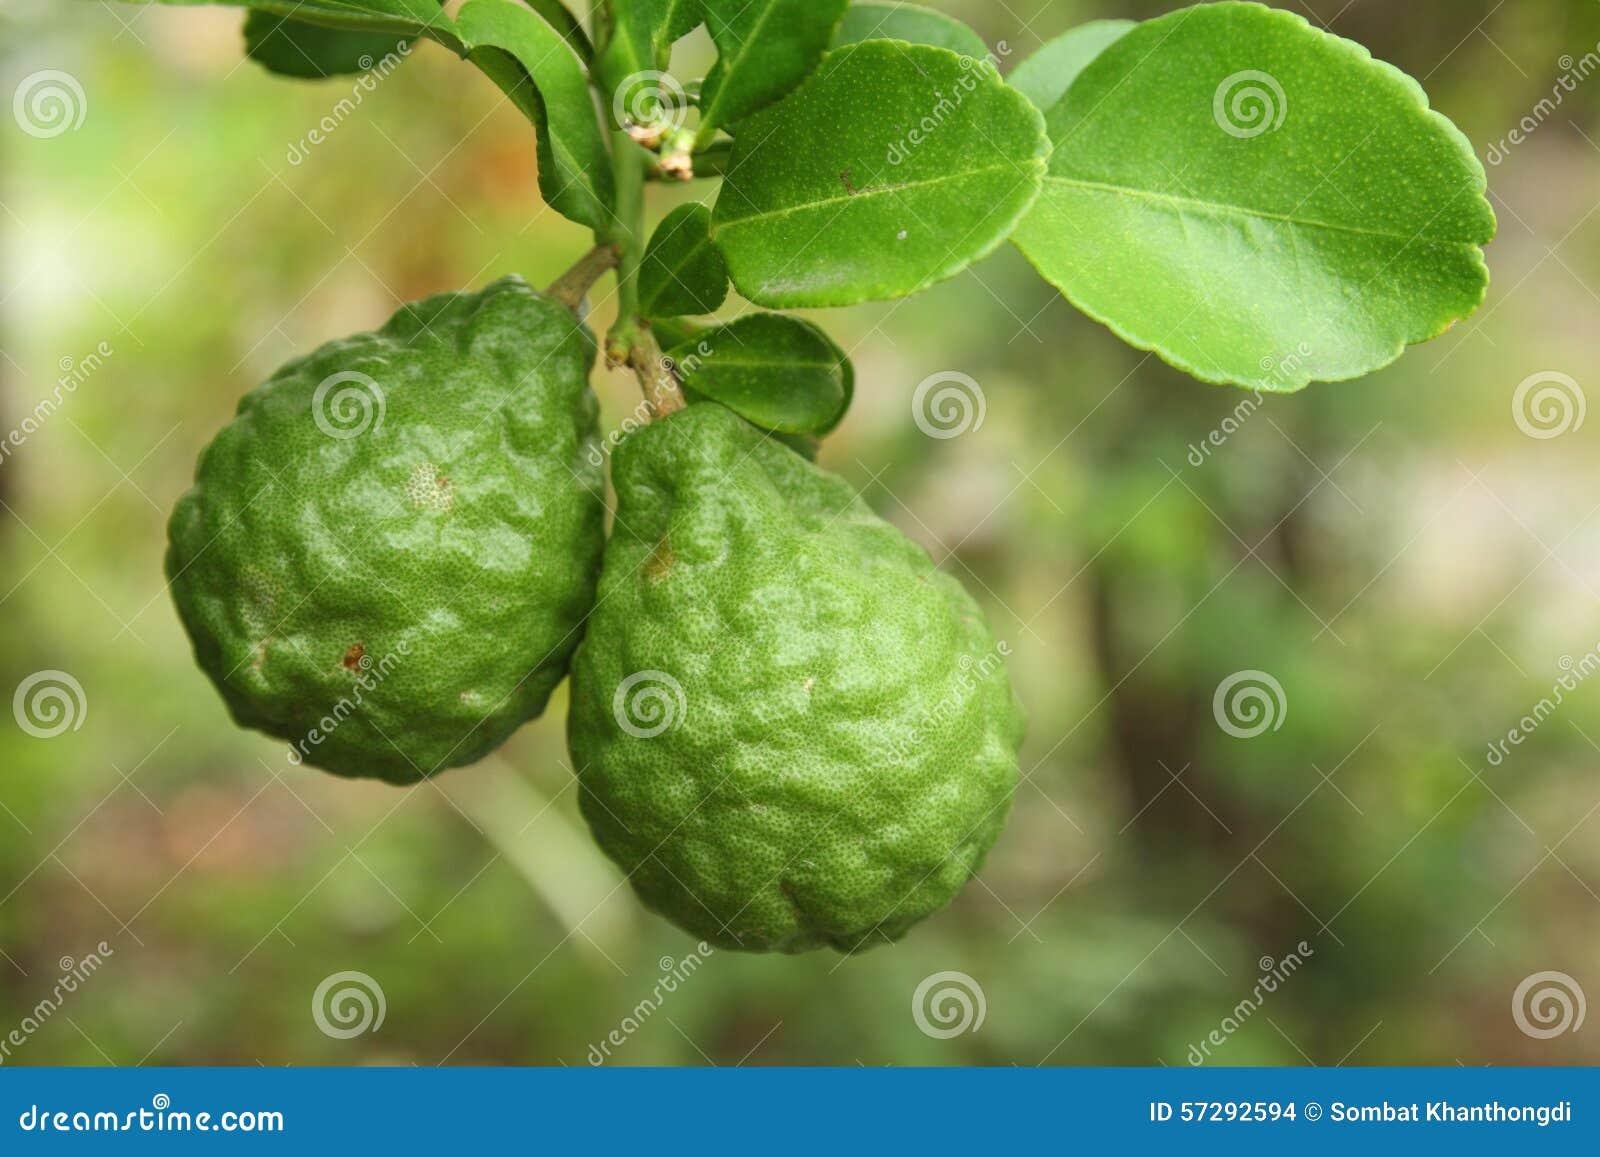 Leech Lime On The Tree Stock Photo - Image: 57292594 Leeches Fruit Tree